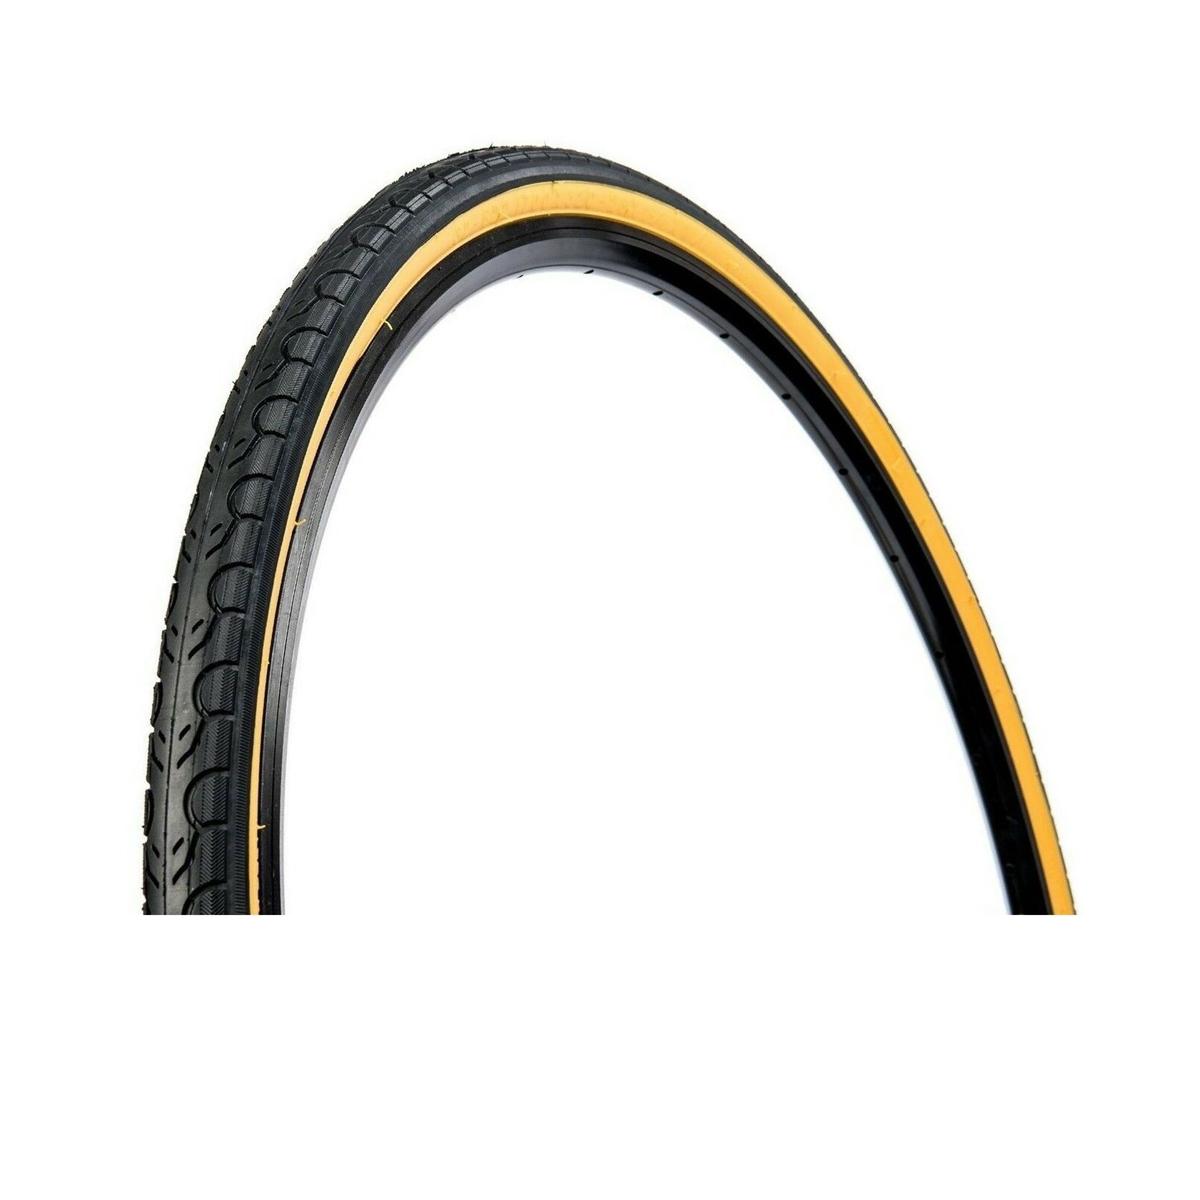 Tire K193 Kwest 28'' Slick 700x28c Wire Black/Skinwall